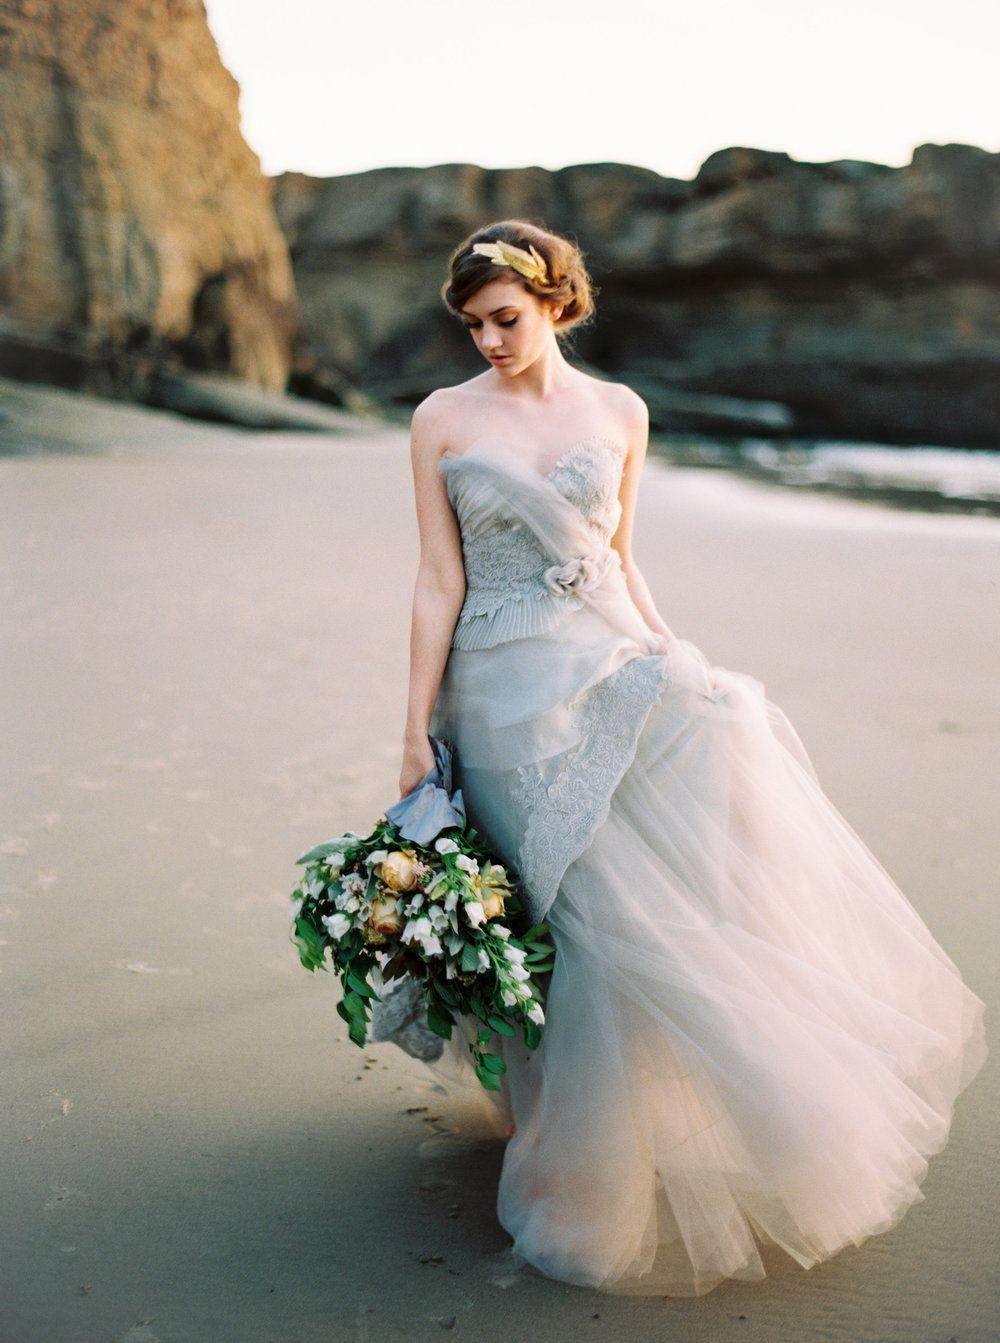 Swan Song Dresses, Bridal dresses, White wedding gowns